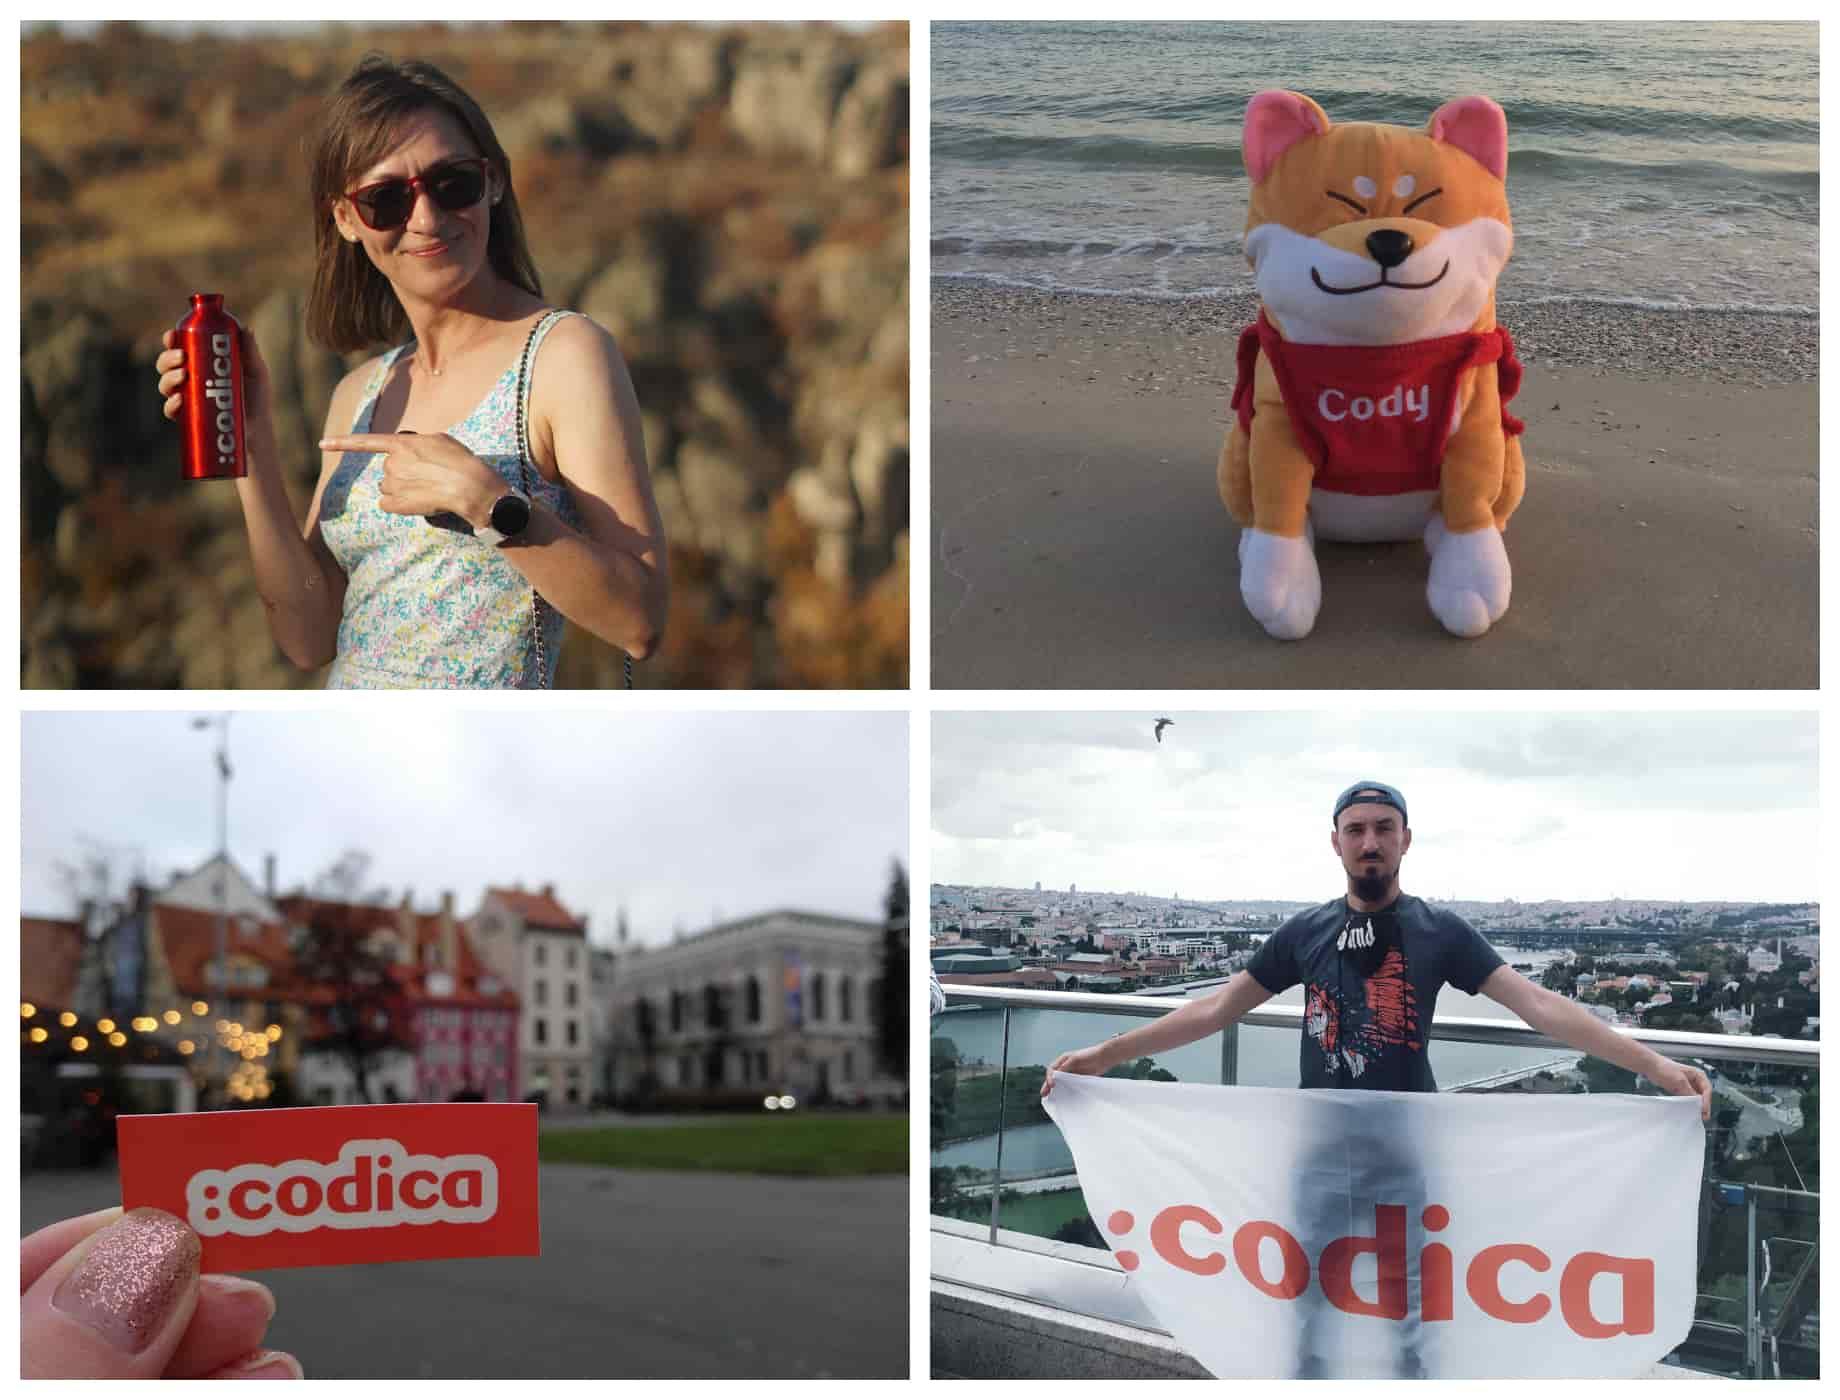 Codica software development team on tour